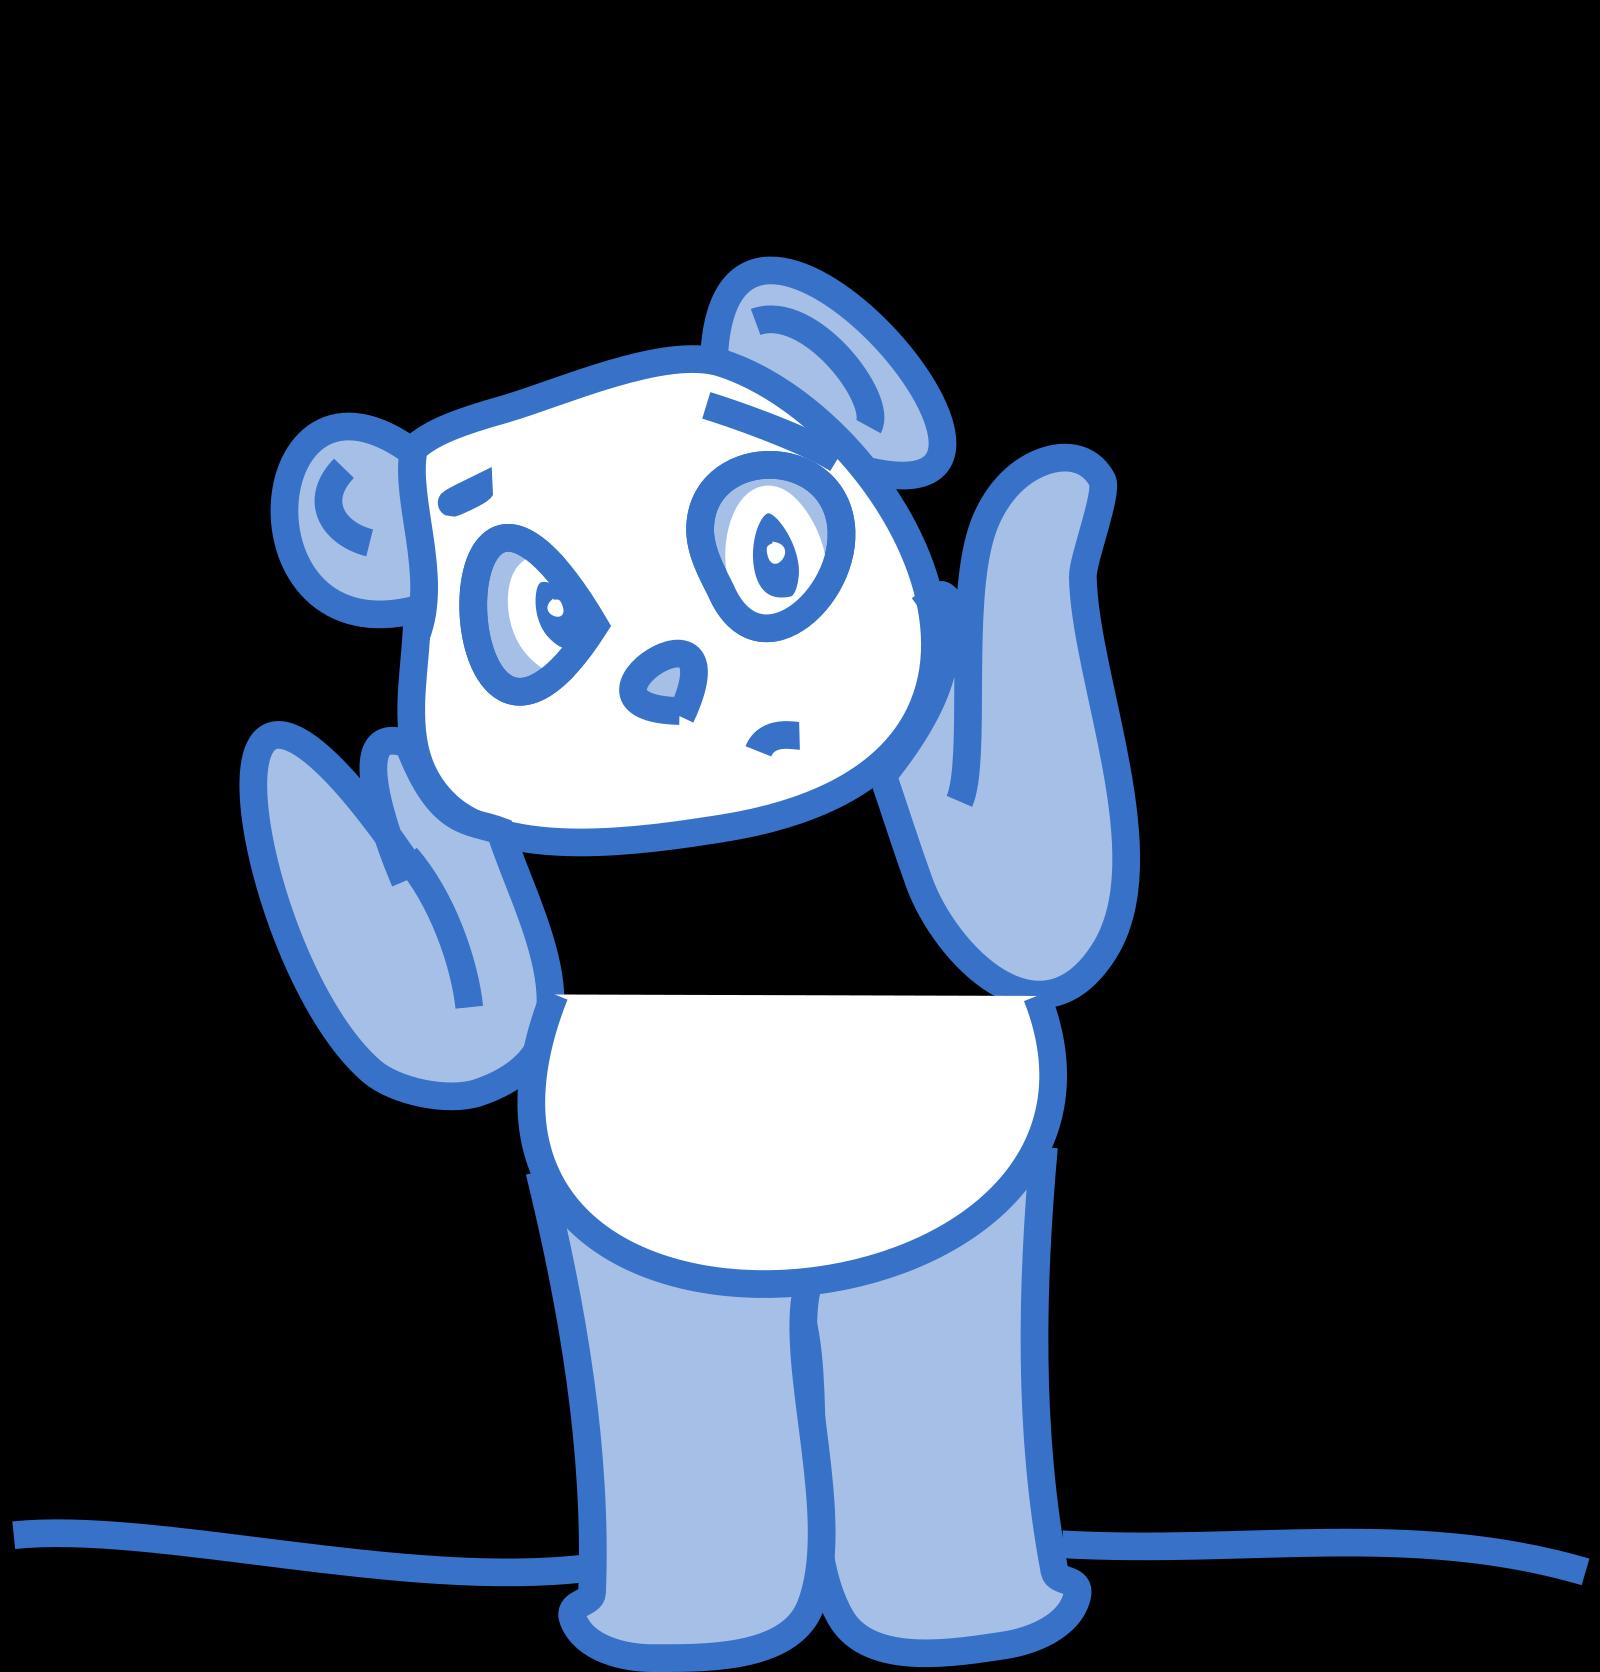 Blue White Cartoon Foot SVG Clip arts